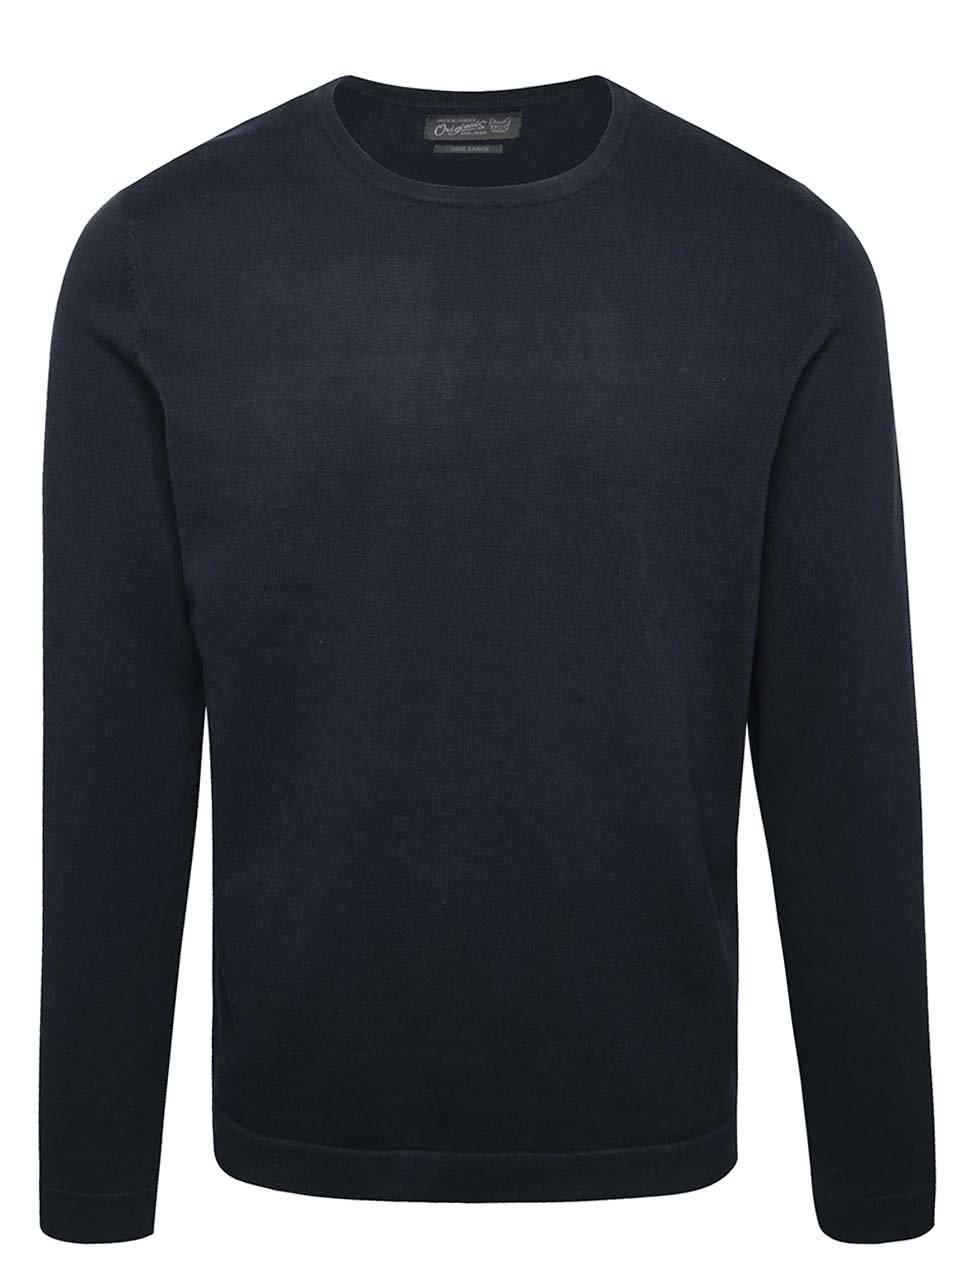 Tmavě modrý lehký svetr Jack & Jones Basic